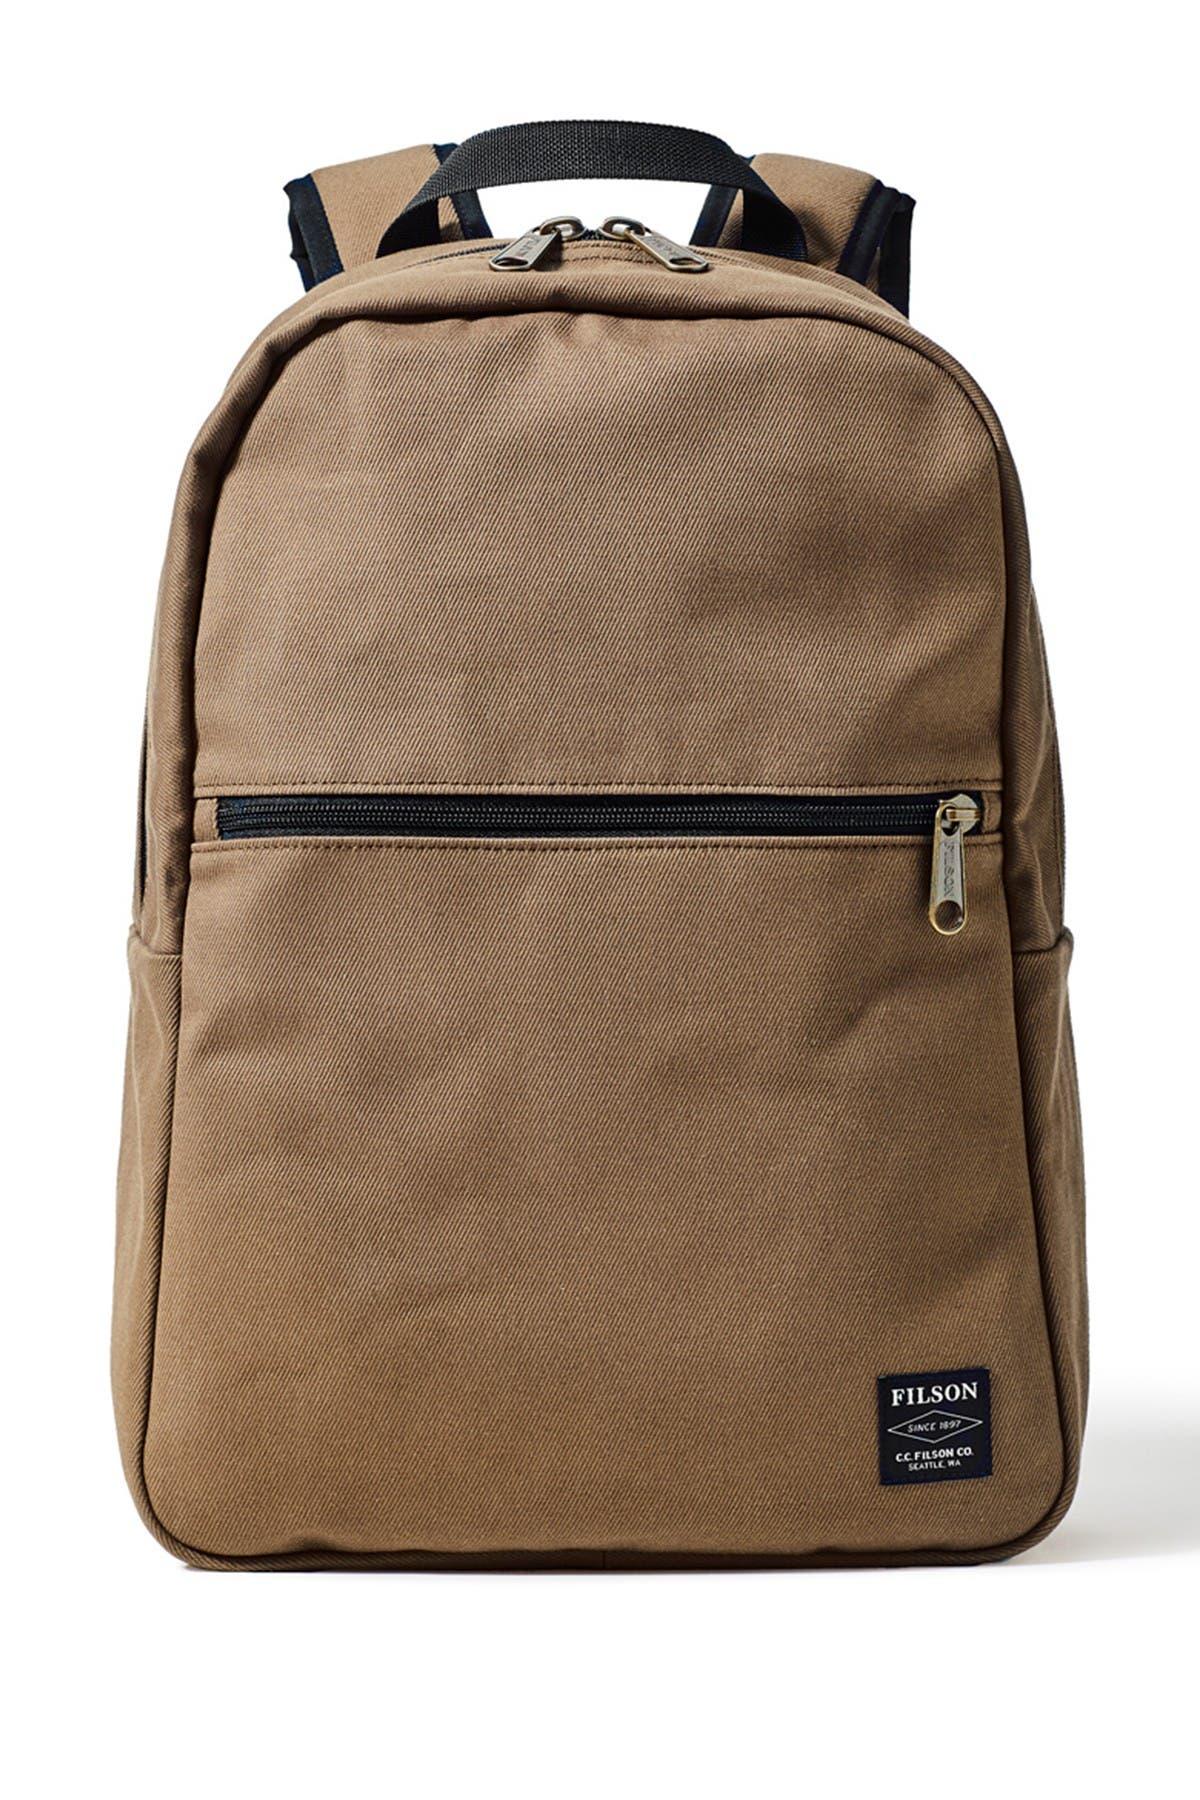 Image of Filson Bandera Backpack